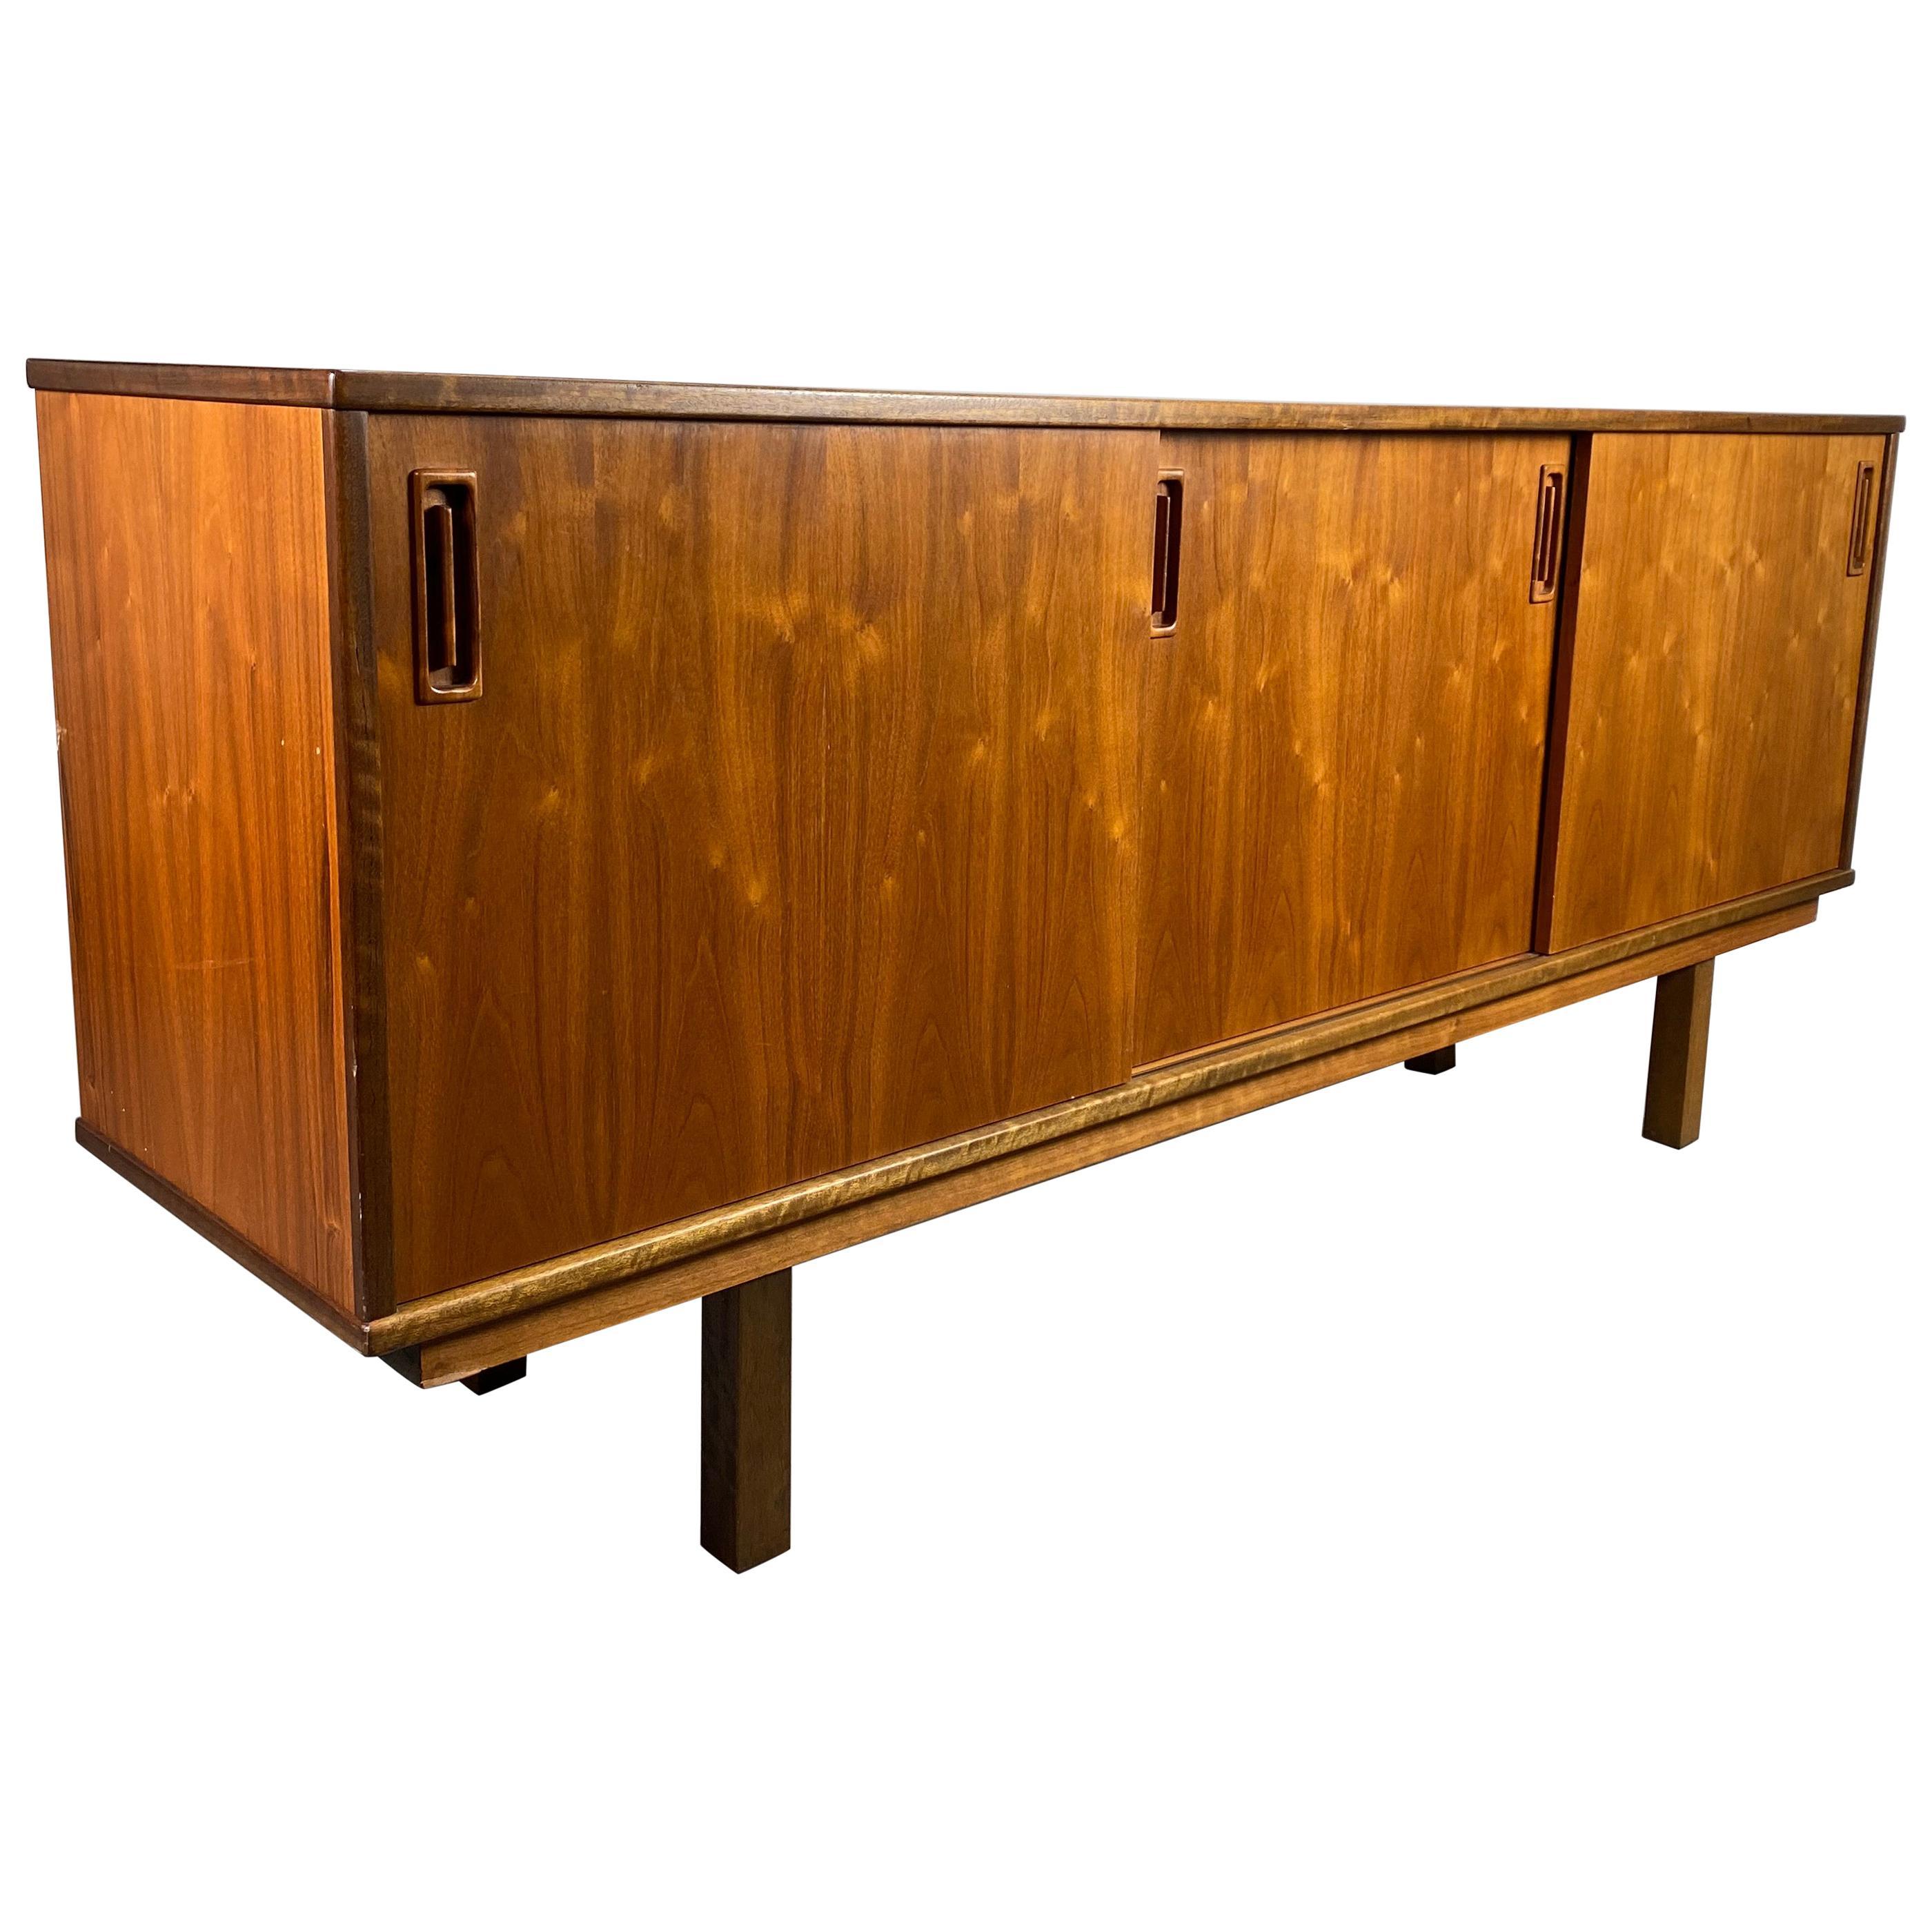 Classic Danish Modern Teak Credenza / Sideboard, Clausen & Son